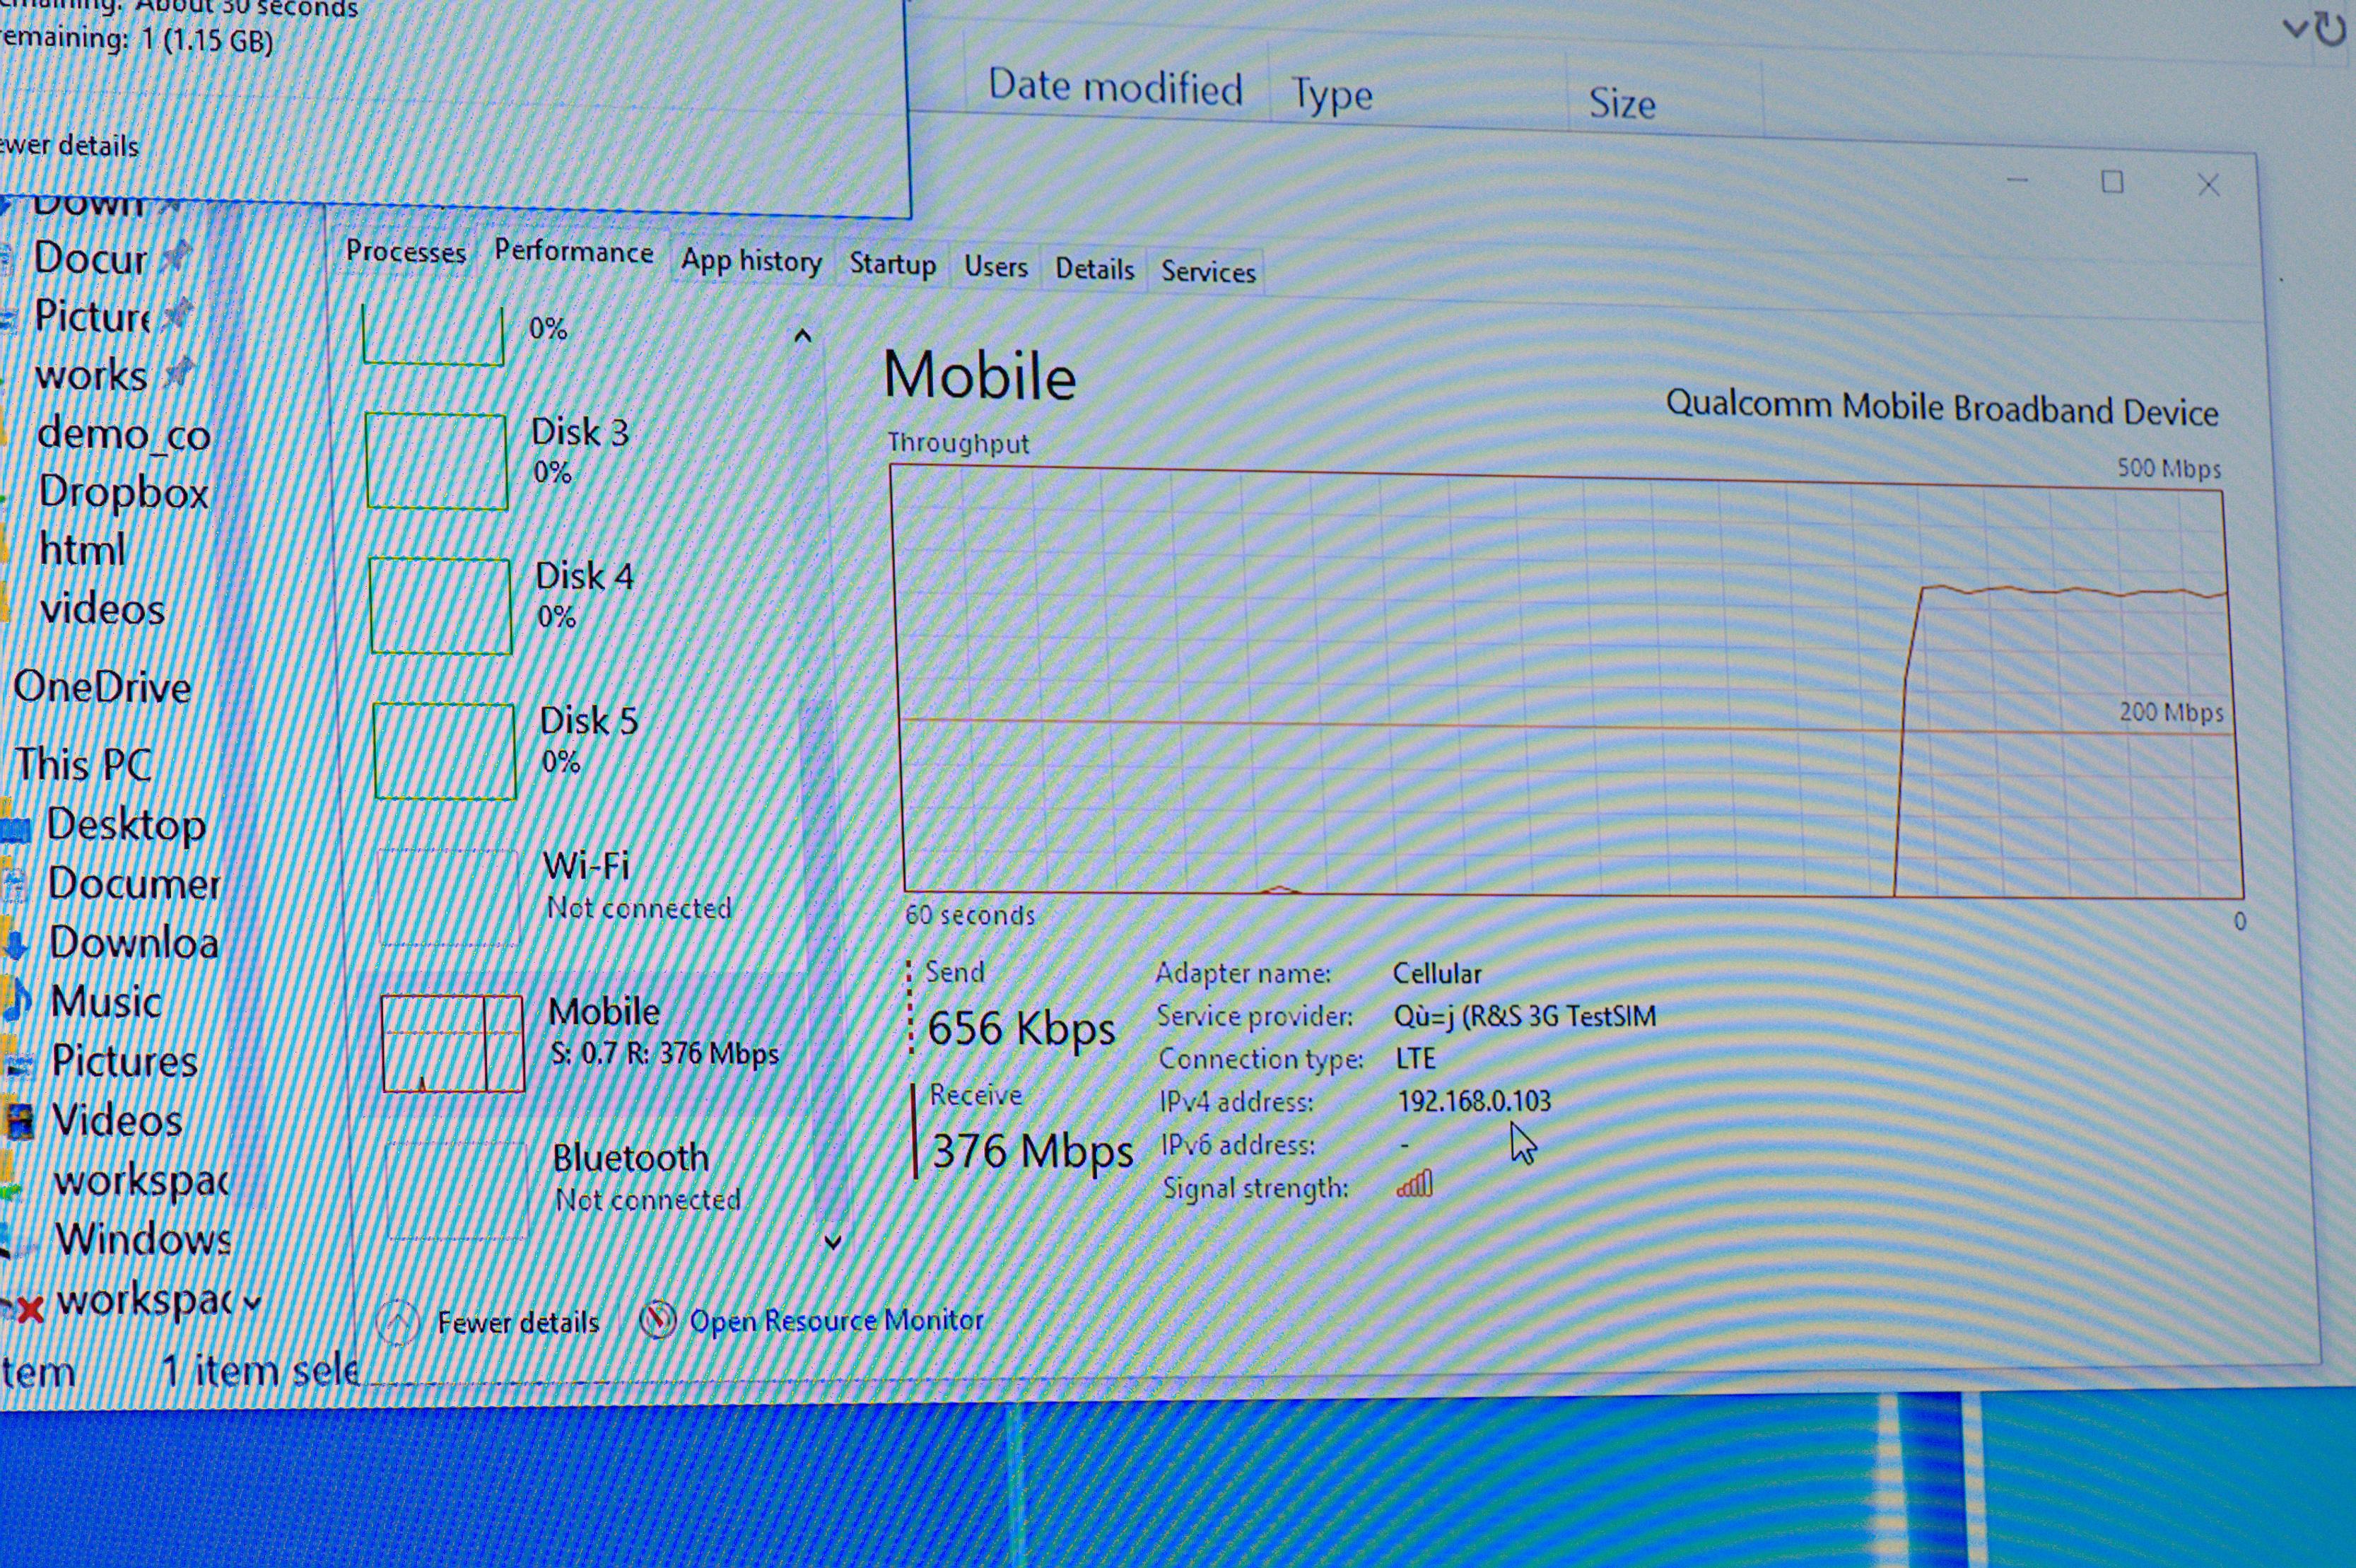 Always Connected PC: Windows 10 on ARM soll Intels x86-Ultrabooks übertreffen - Der Snapdragon 835 hat integriertes LTE. (Foto: Andreas Sebayang/Golem.de)